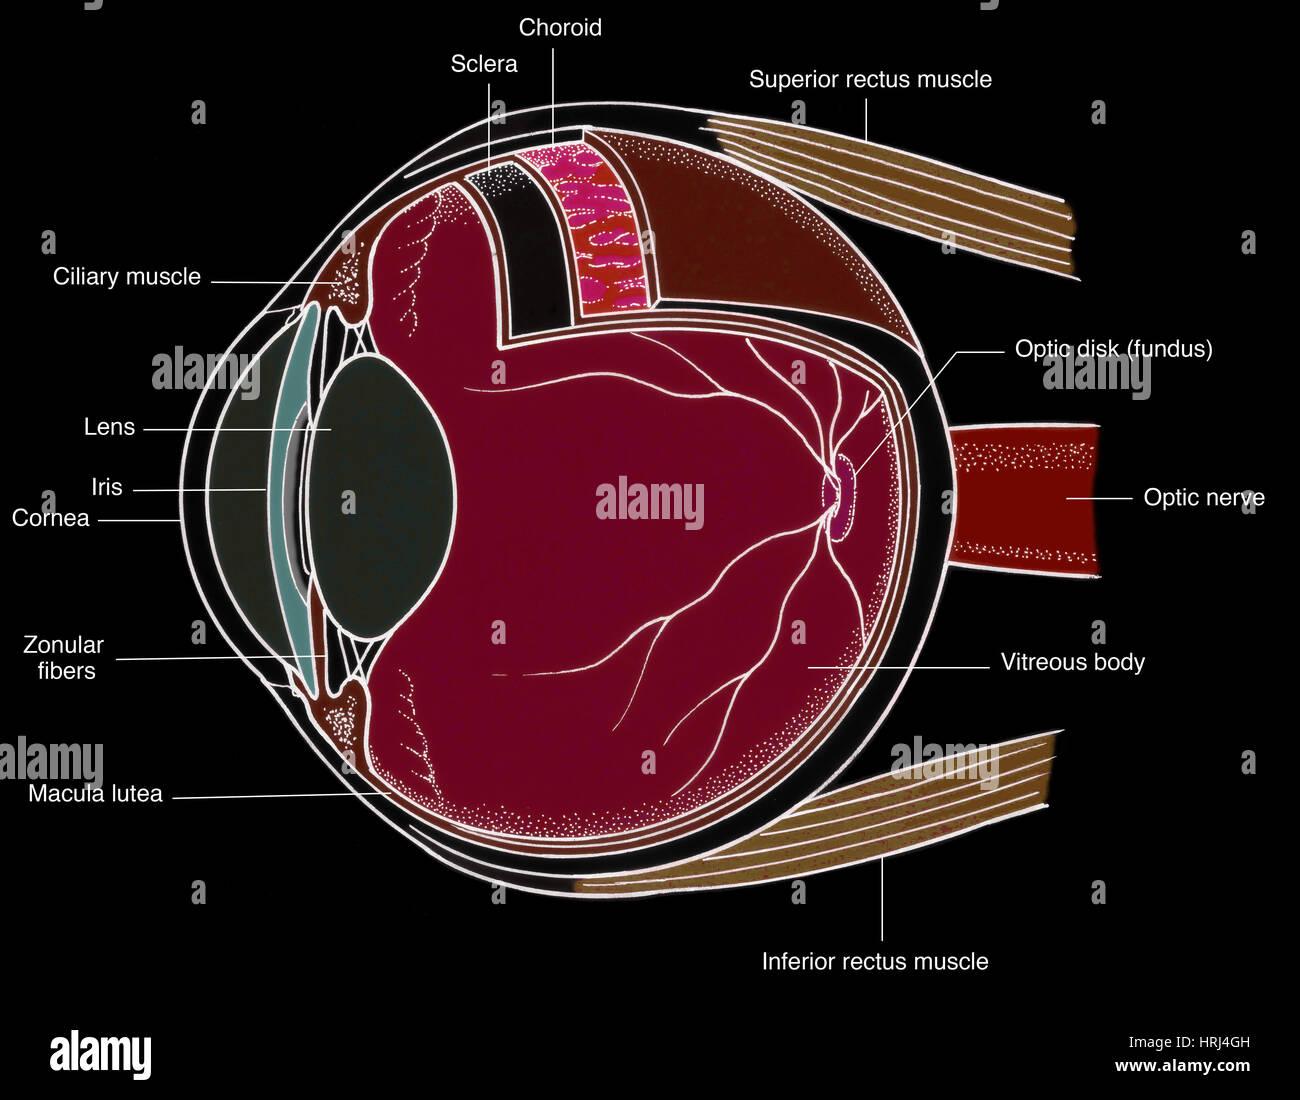 Illustration of Eye Anatomy Stock Photo: 135008401 - Alamy